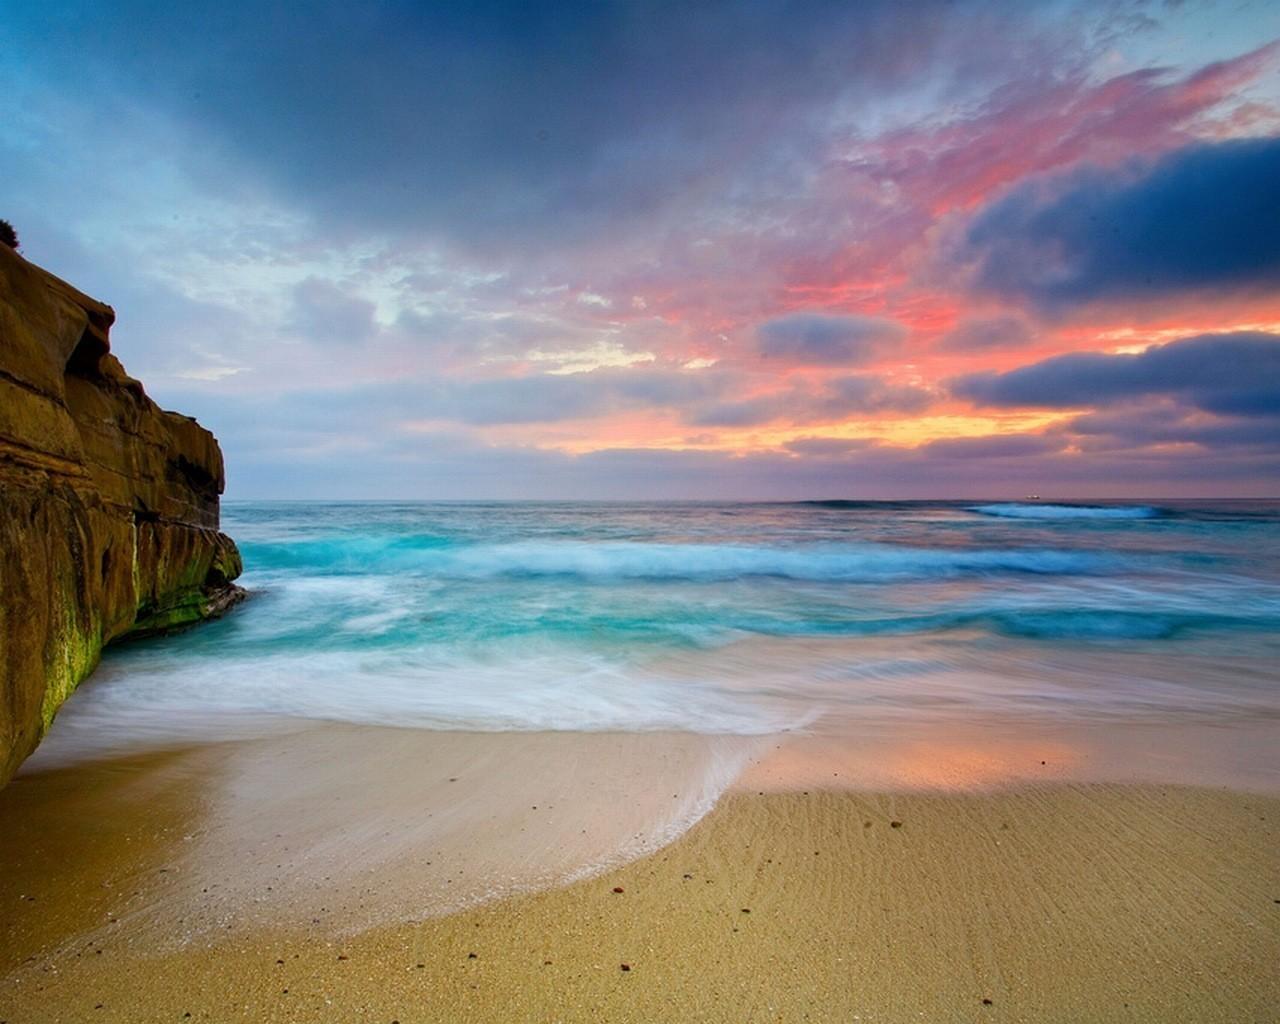 39] Beach Ocean Wallpaper on WallpaperSafari 1280x1024